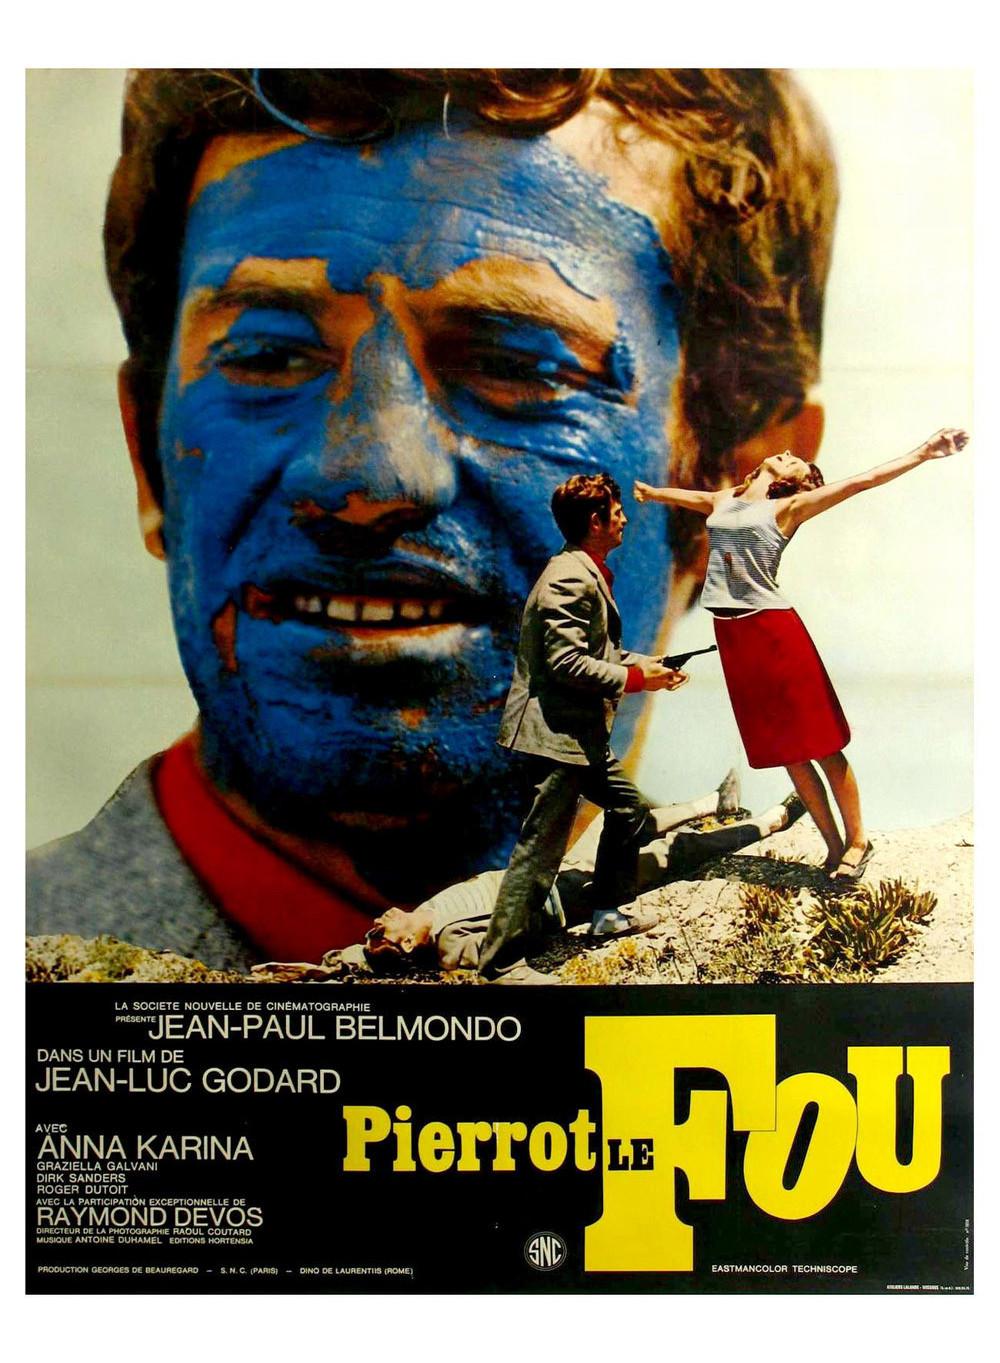 Pierrot le fou de Jean-Luc Godard